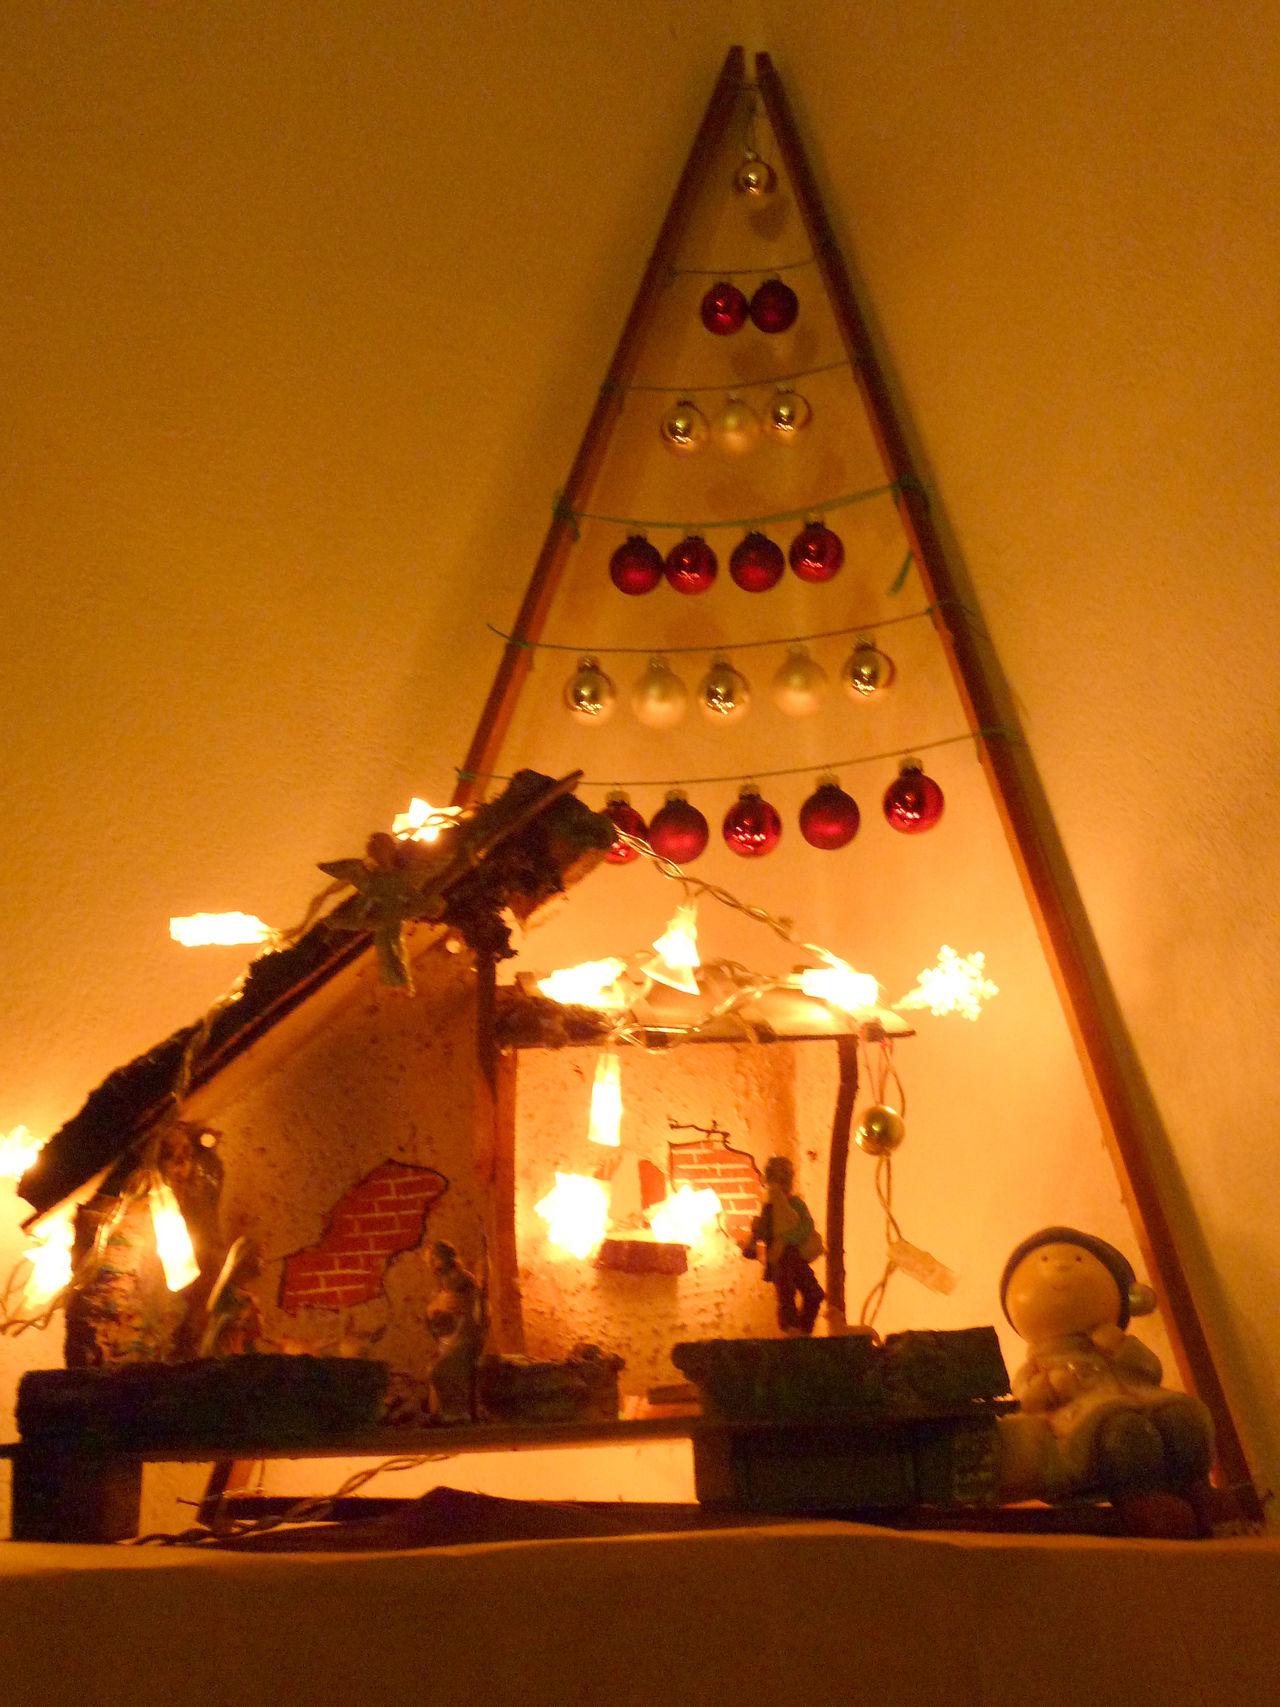 Christmas Christmas Decorations Christmas Lights Christmas Tree Lowlight Nativity Nativity Scene Religion